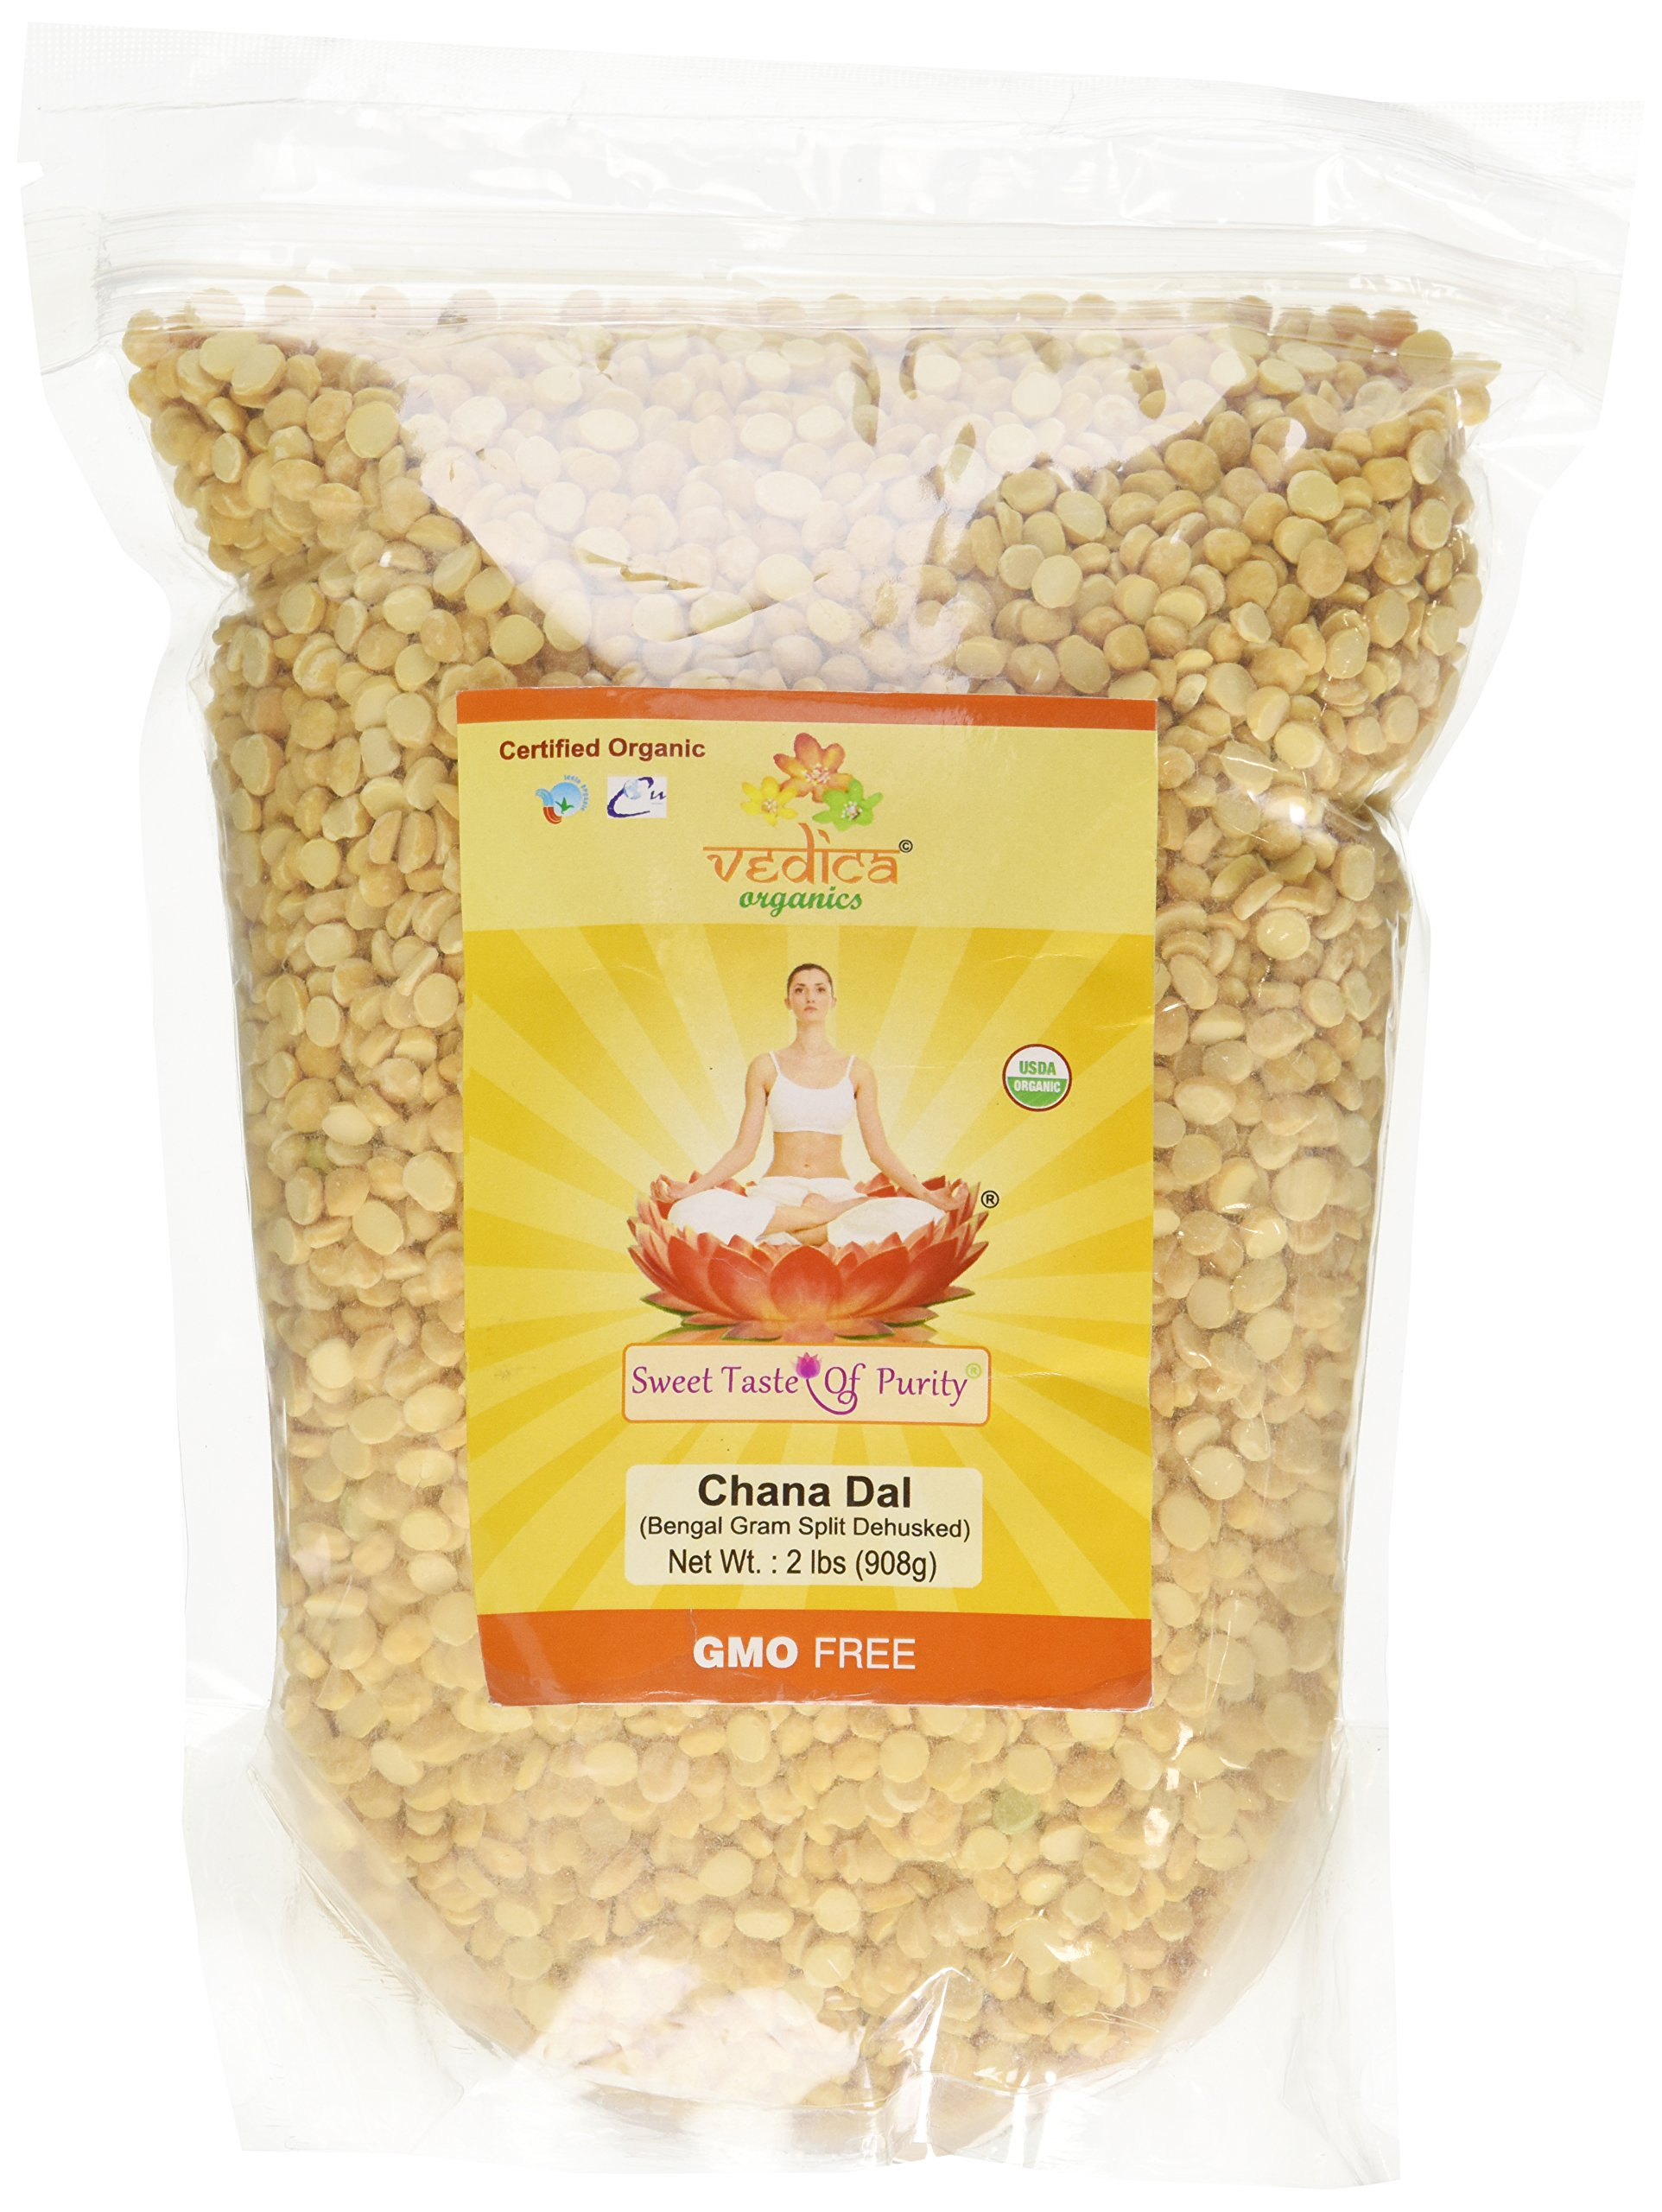 Organic Chana Dal (Bengal Gram Split Dehusked) (2 Lbs)